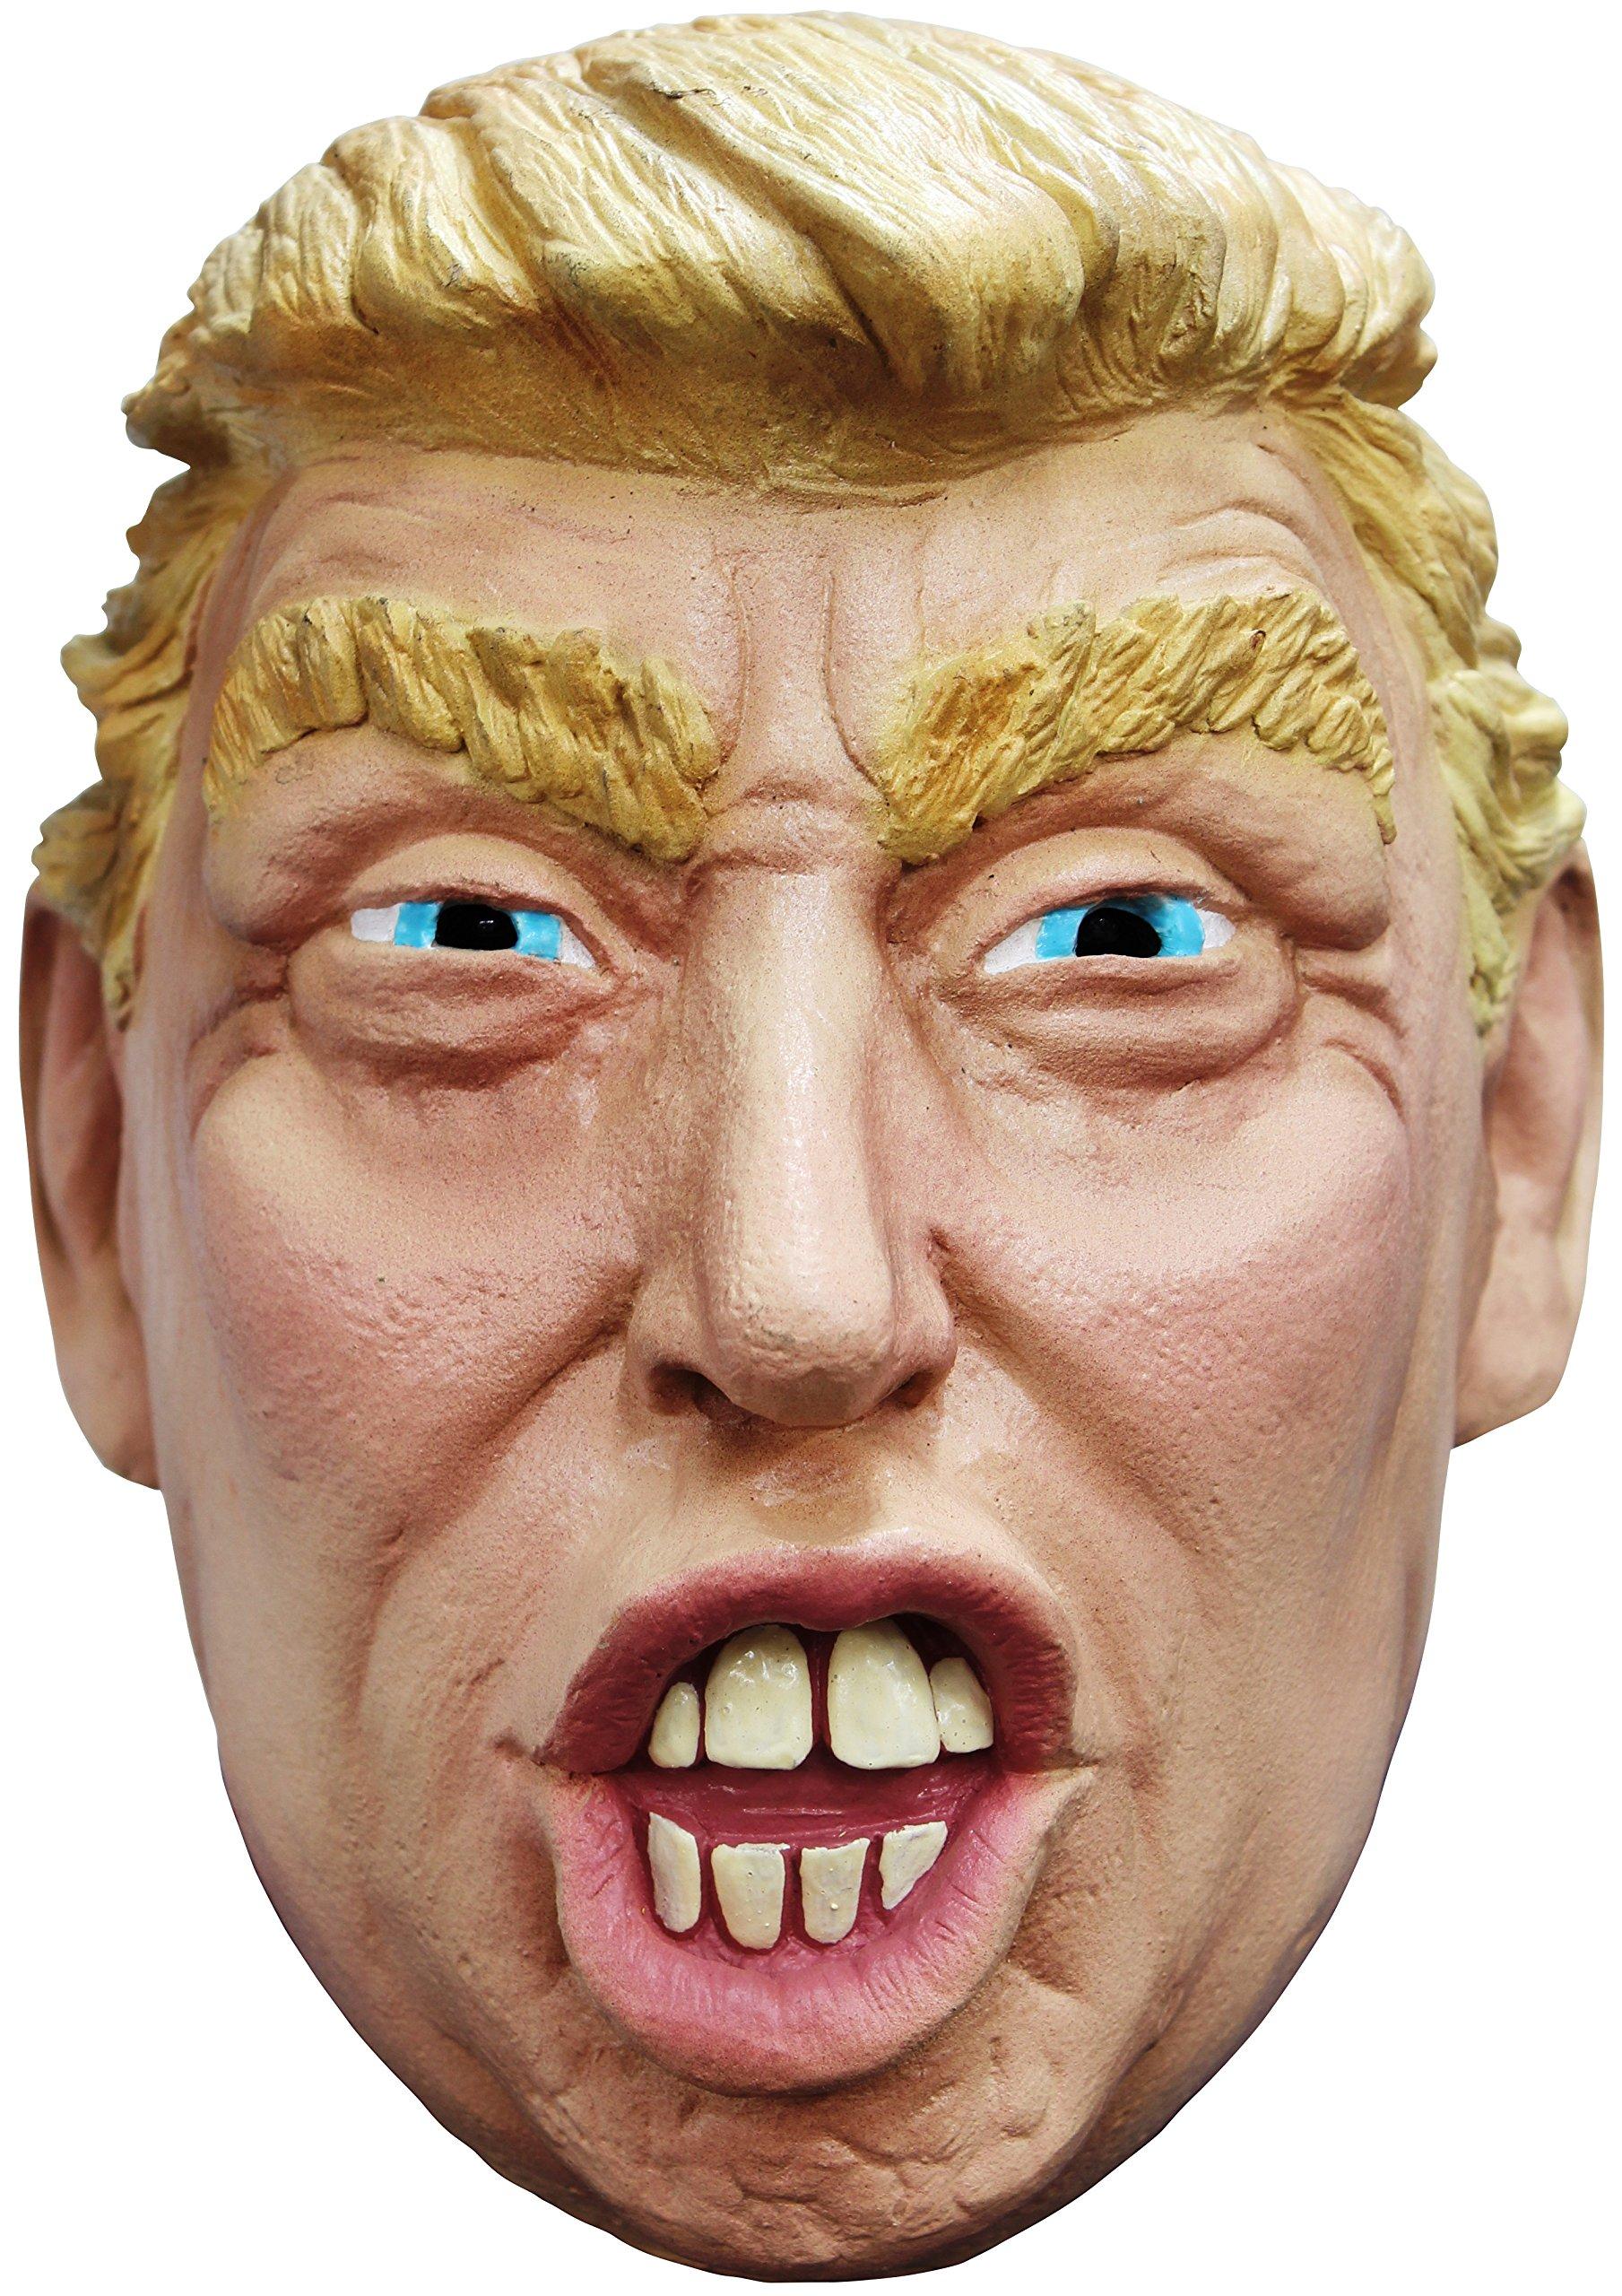 President Donald Trump Funny Latex Halloween Mask Costume Accessory